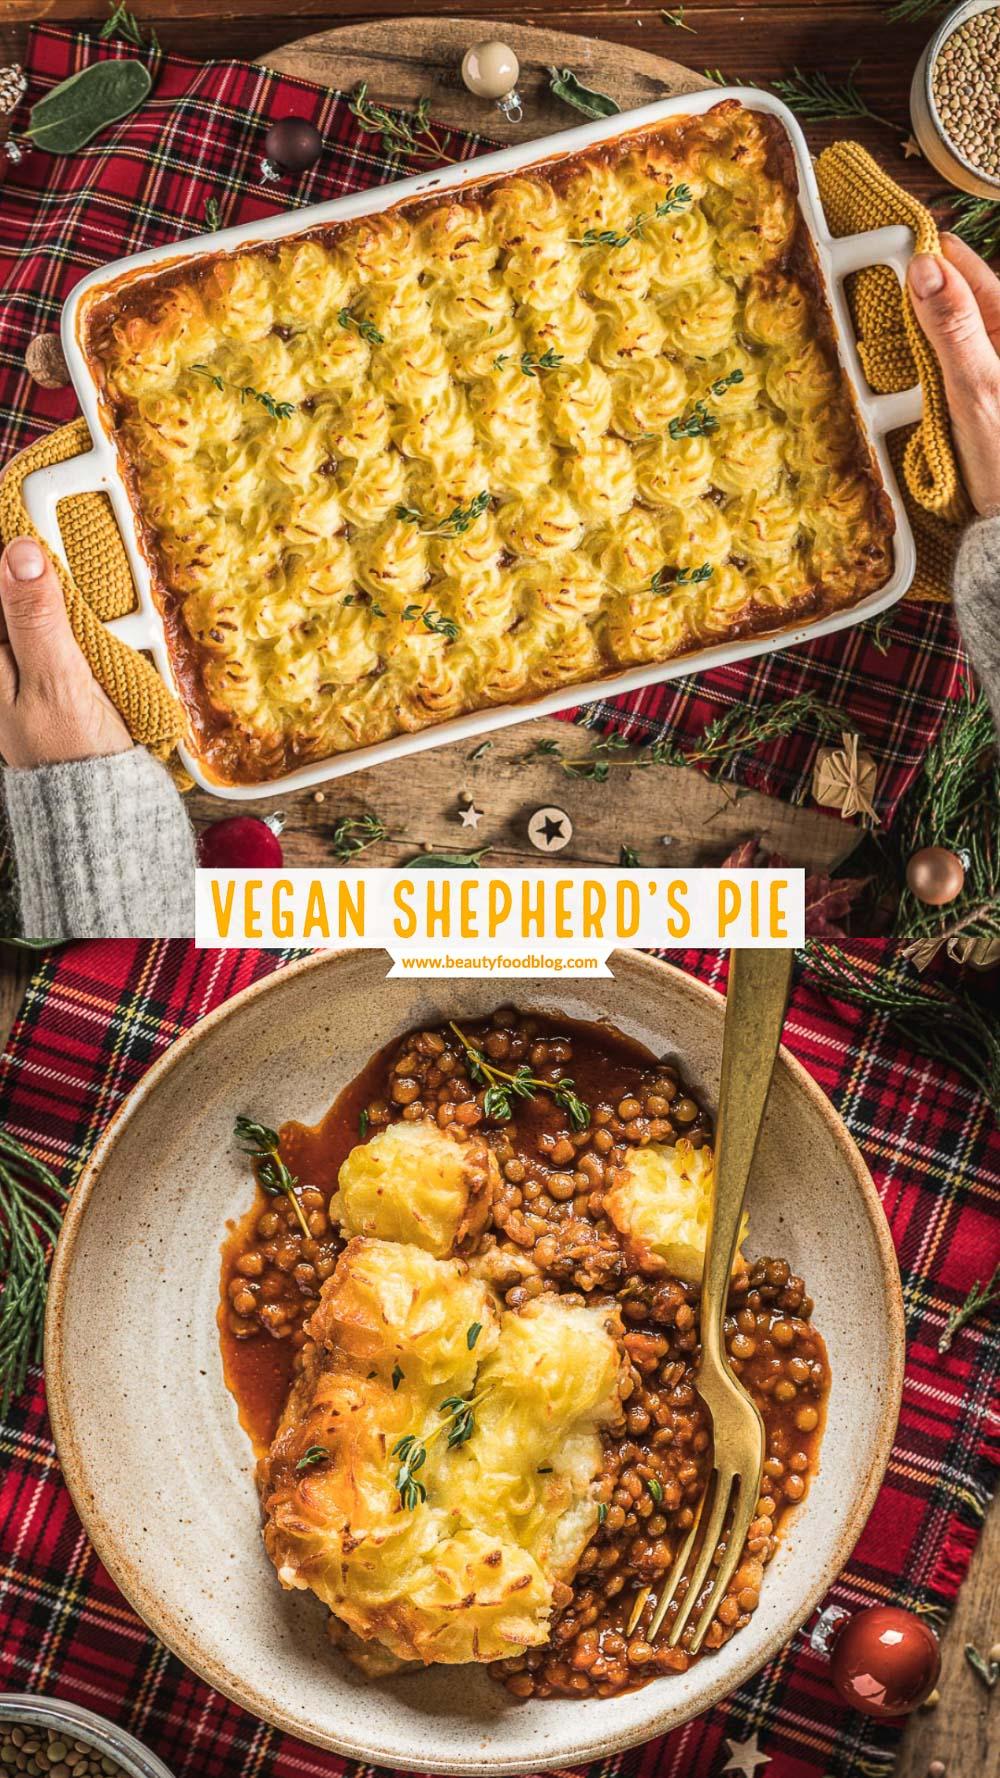 Vegan Shepherd's Pie di lenticchie con ragù di lenticchie funghi e purè di patate per Inverno Natale healthy lentil shepherd's pie recipe with mash potatoes for Thanksgiving